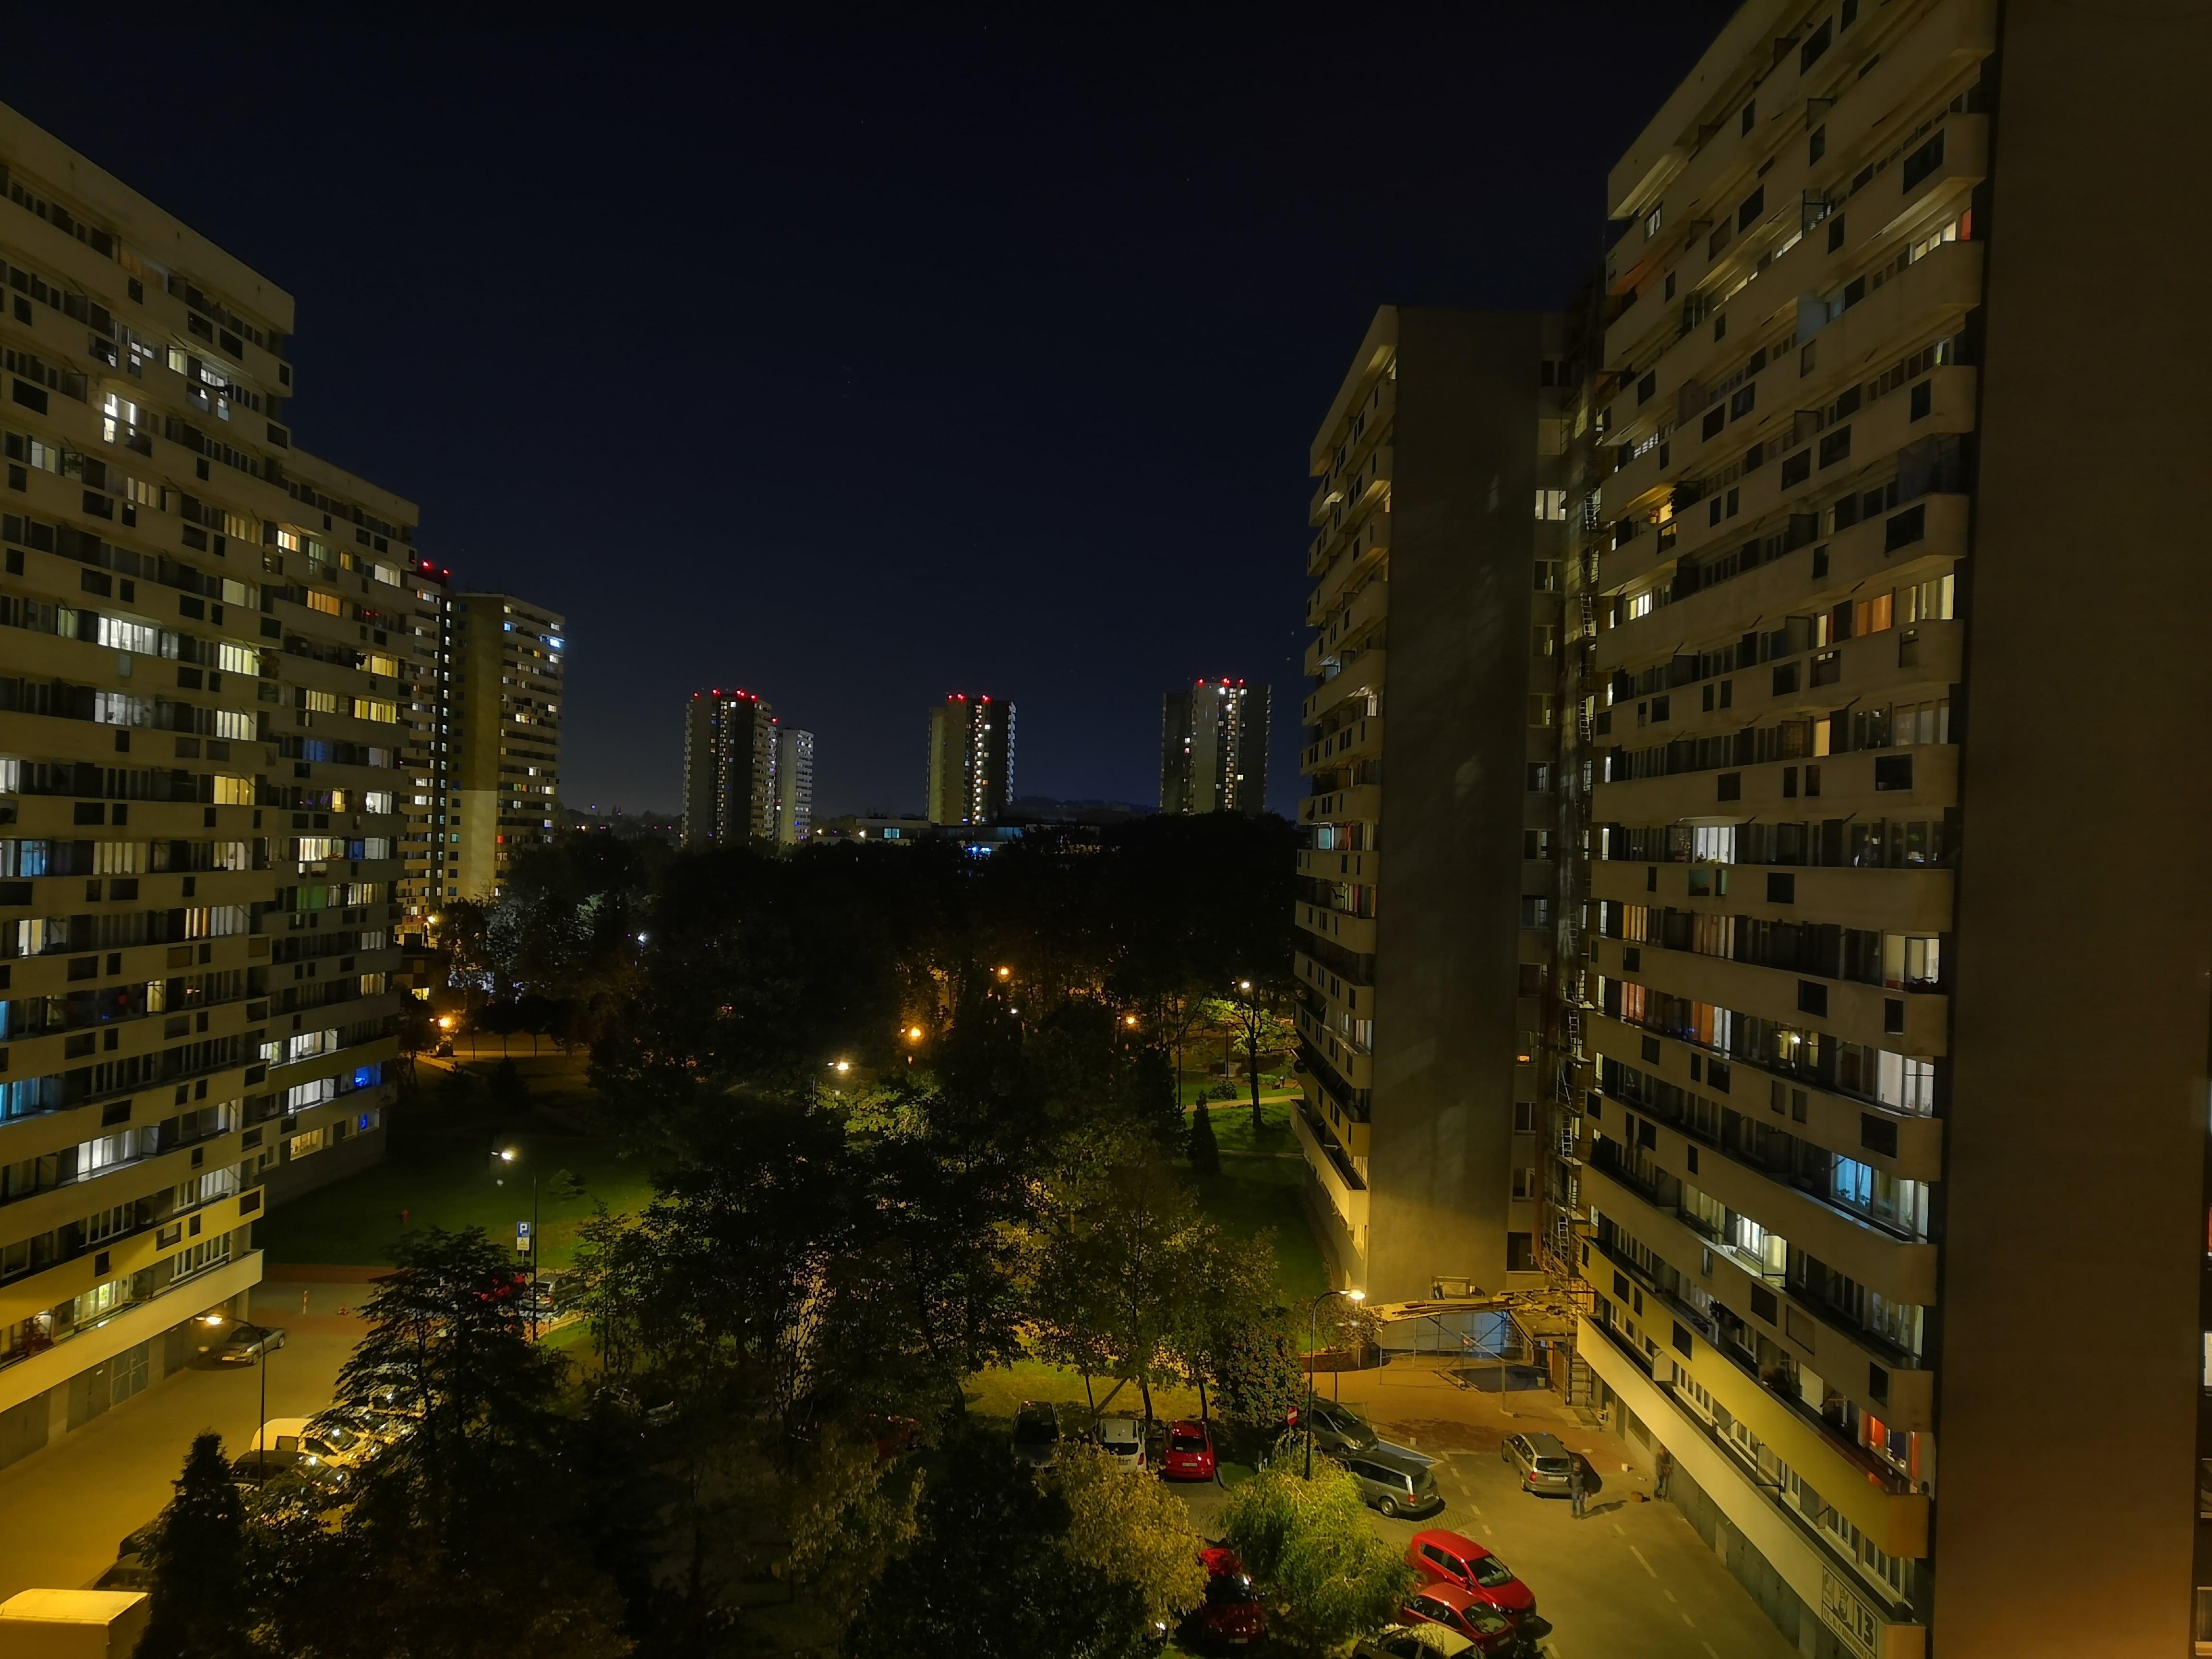 Zdjęcia nocne - Huawei Nova 3